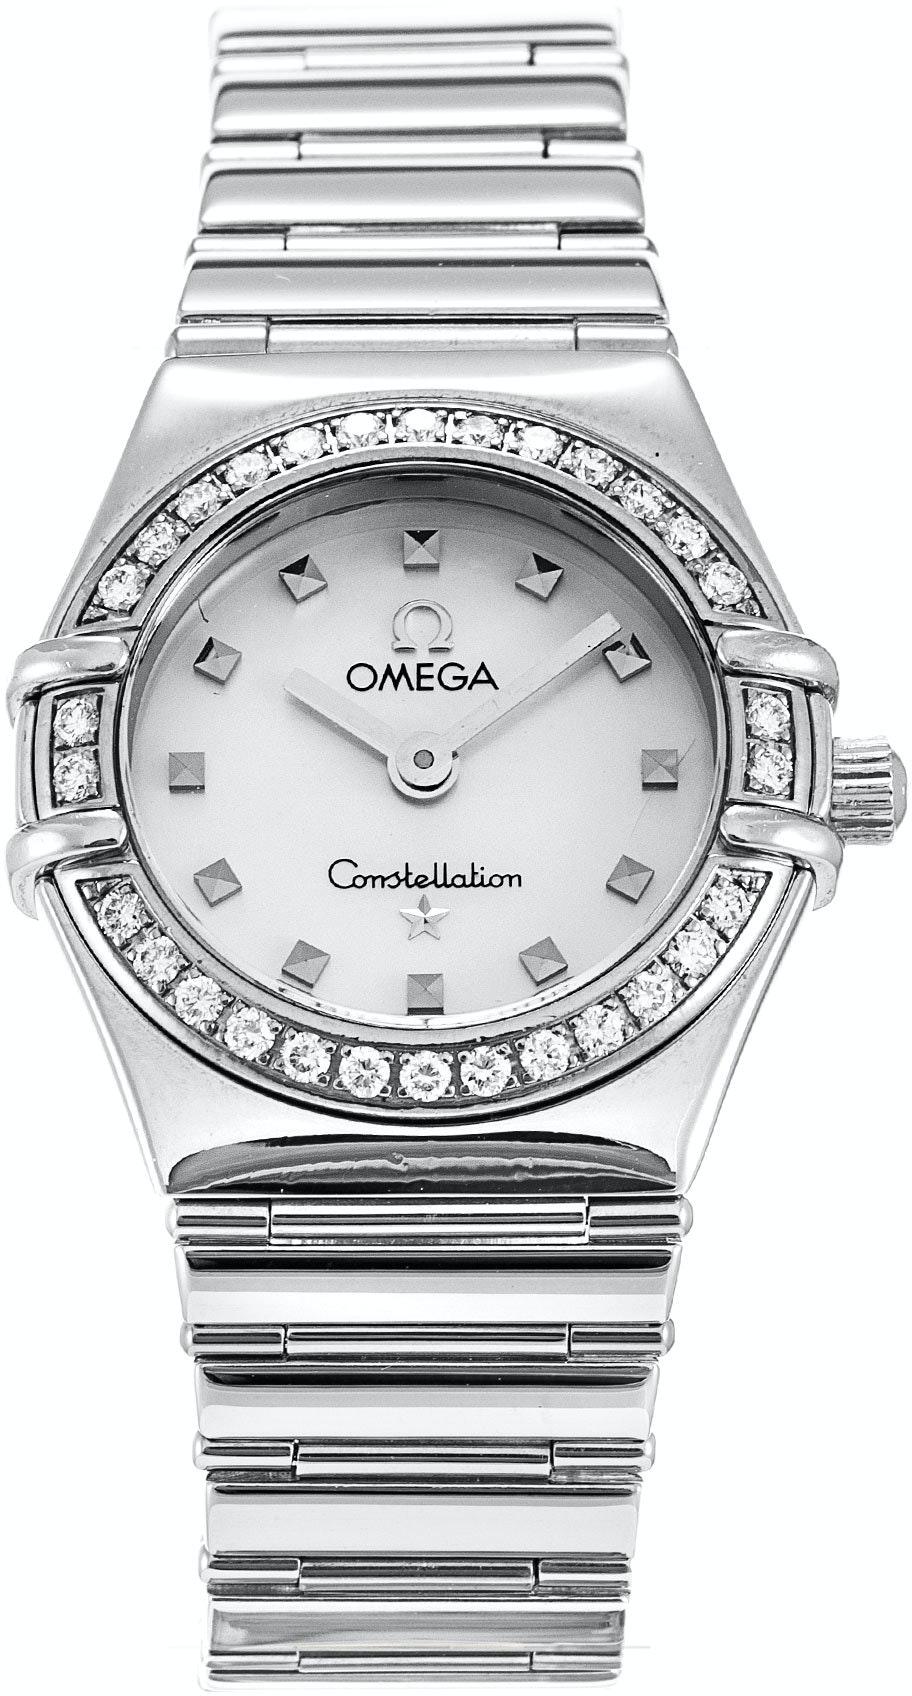 Omega Constellation 1465.71.00